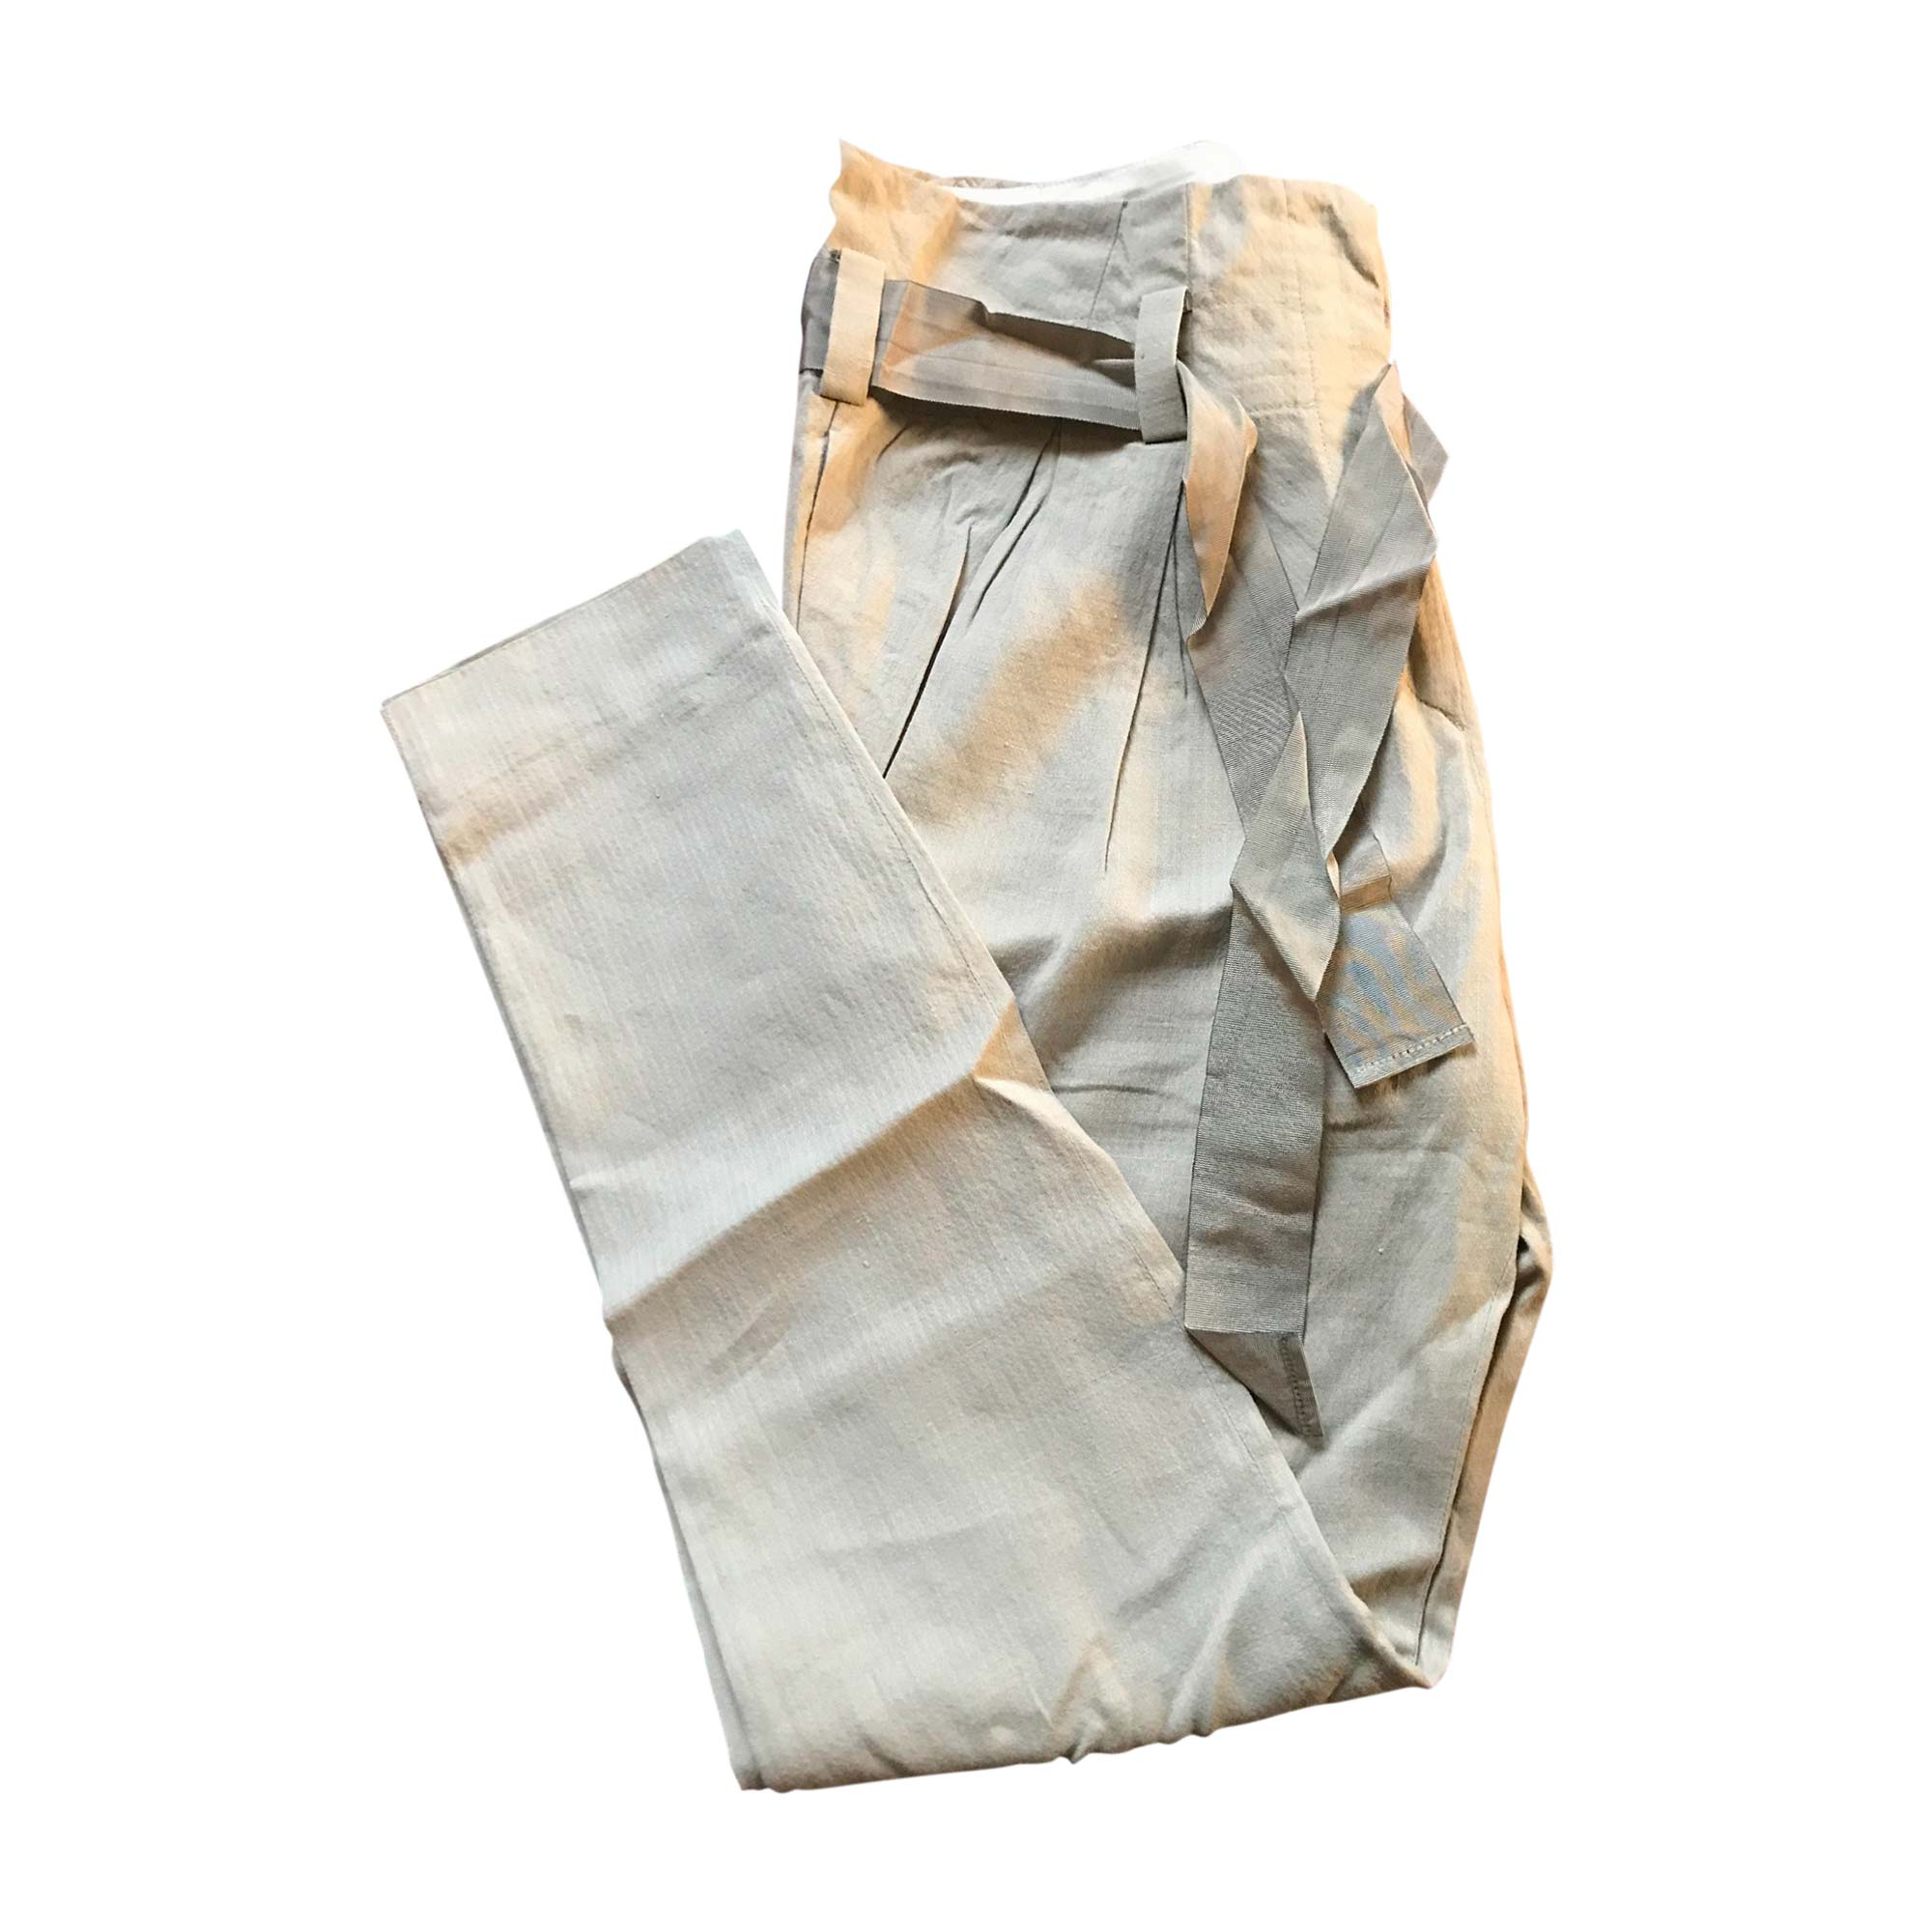 Pantalon carotte ISABEL MARANT Beige, camel